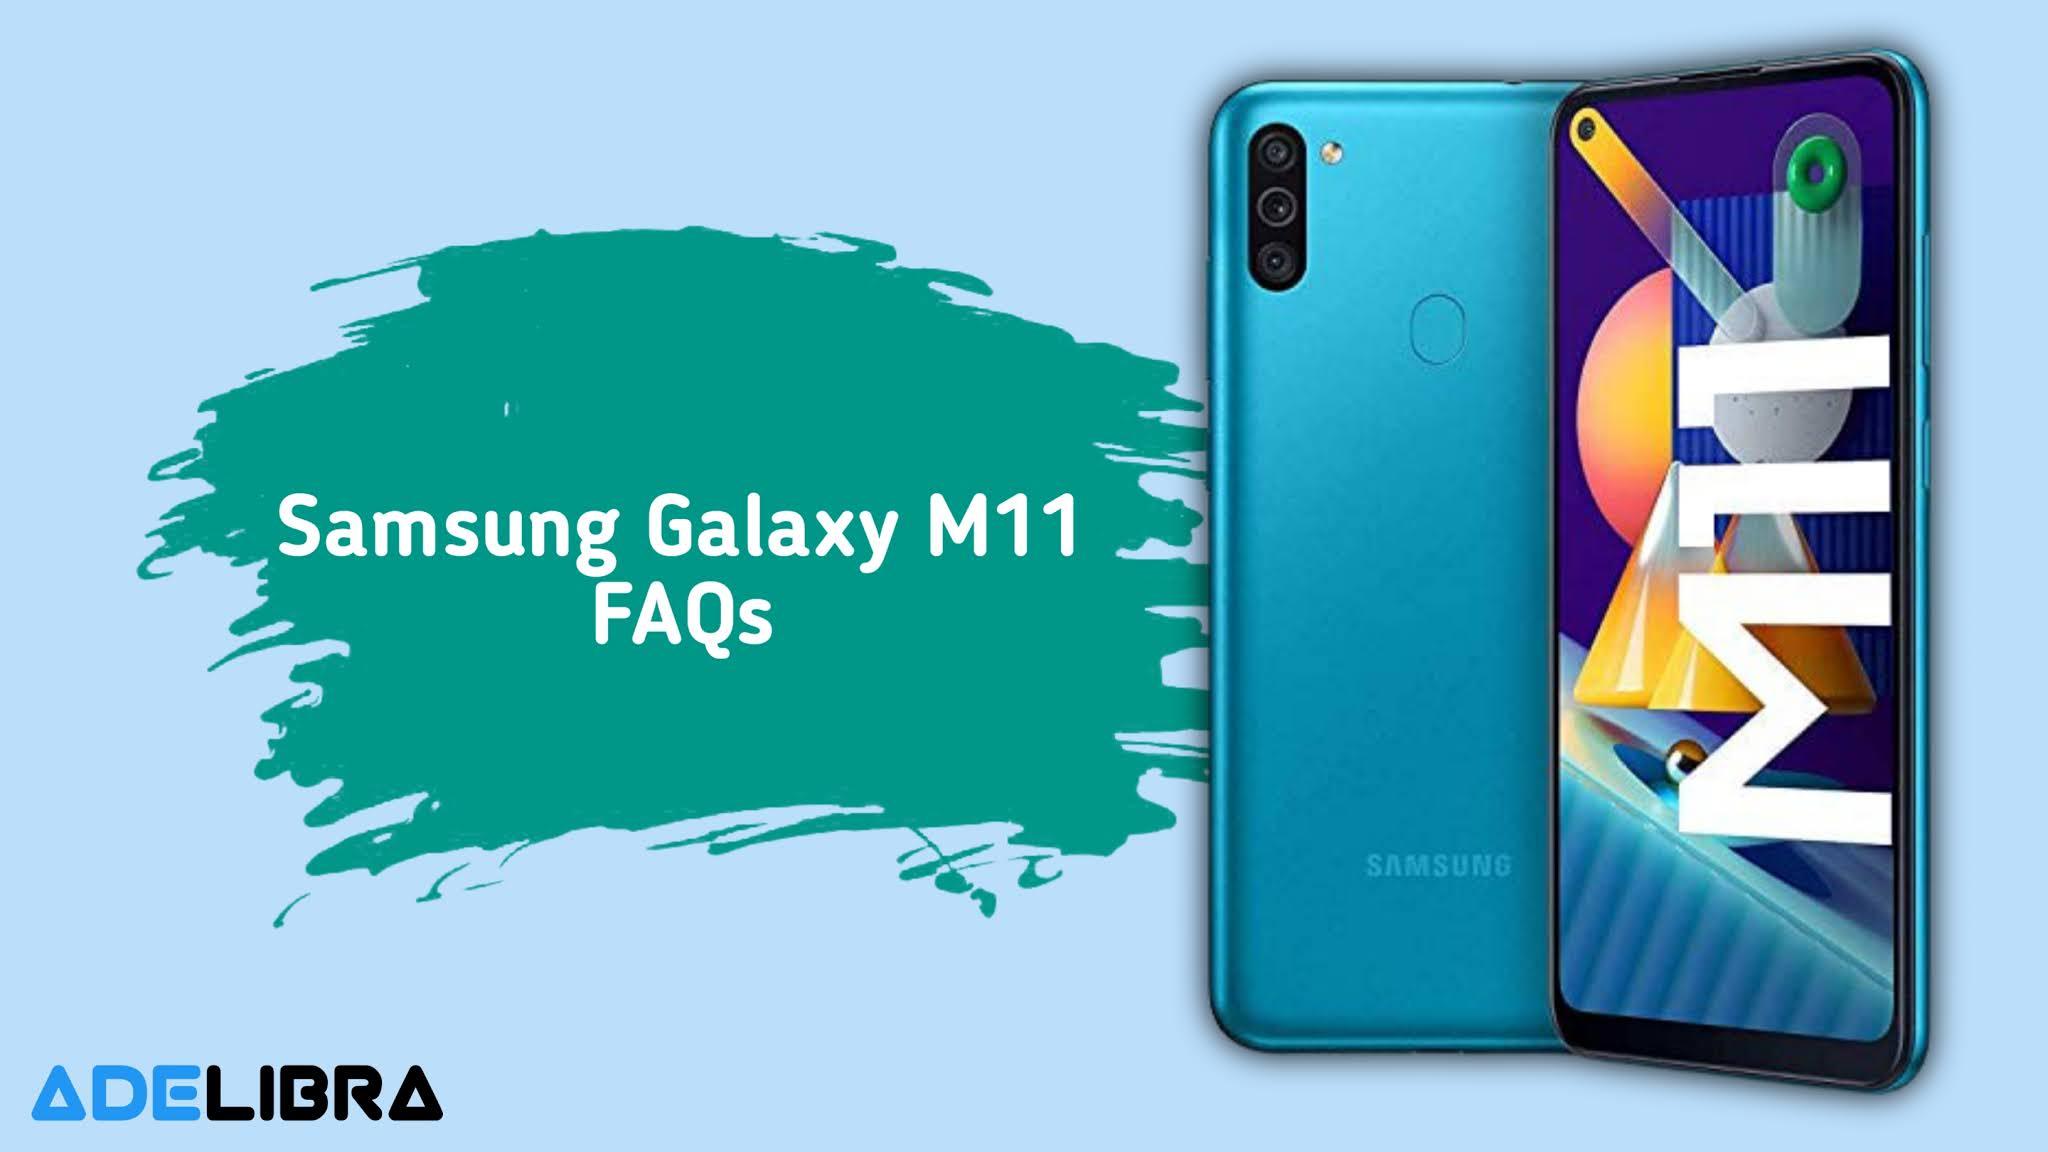 Samsung Galaxy M11 FAQs